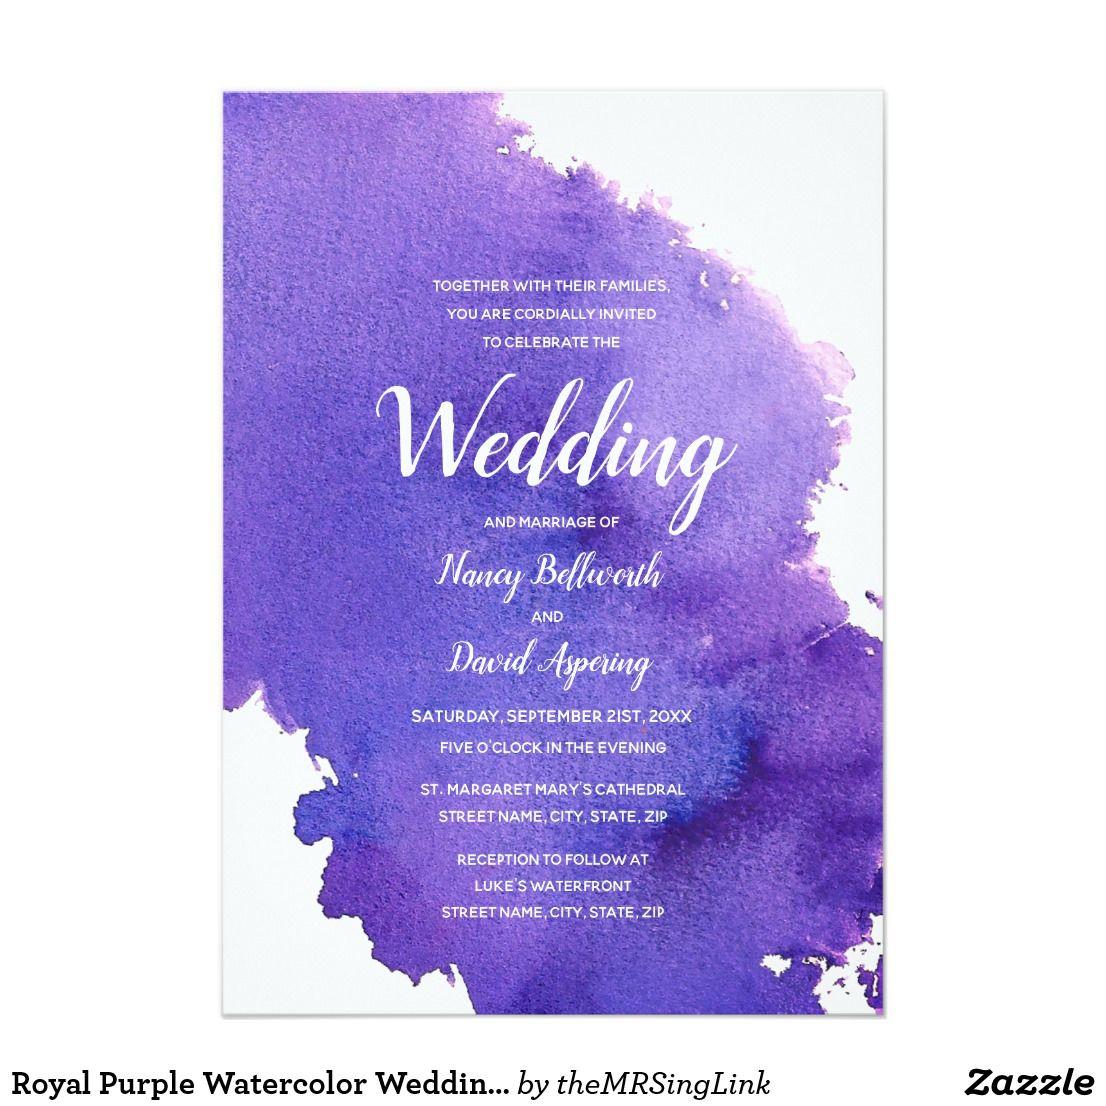 Royal Purple Watercolor Wedding Invitation